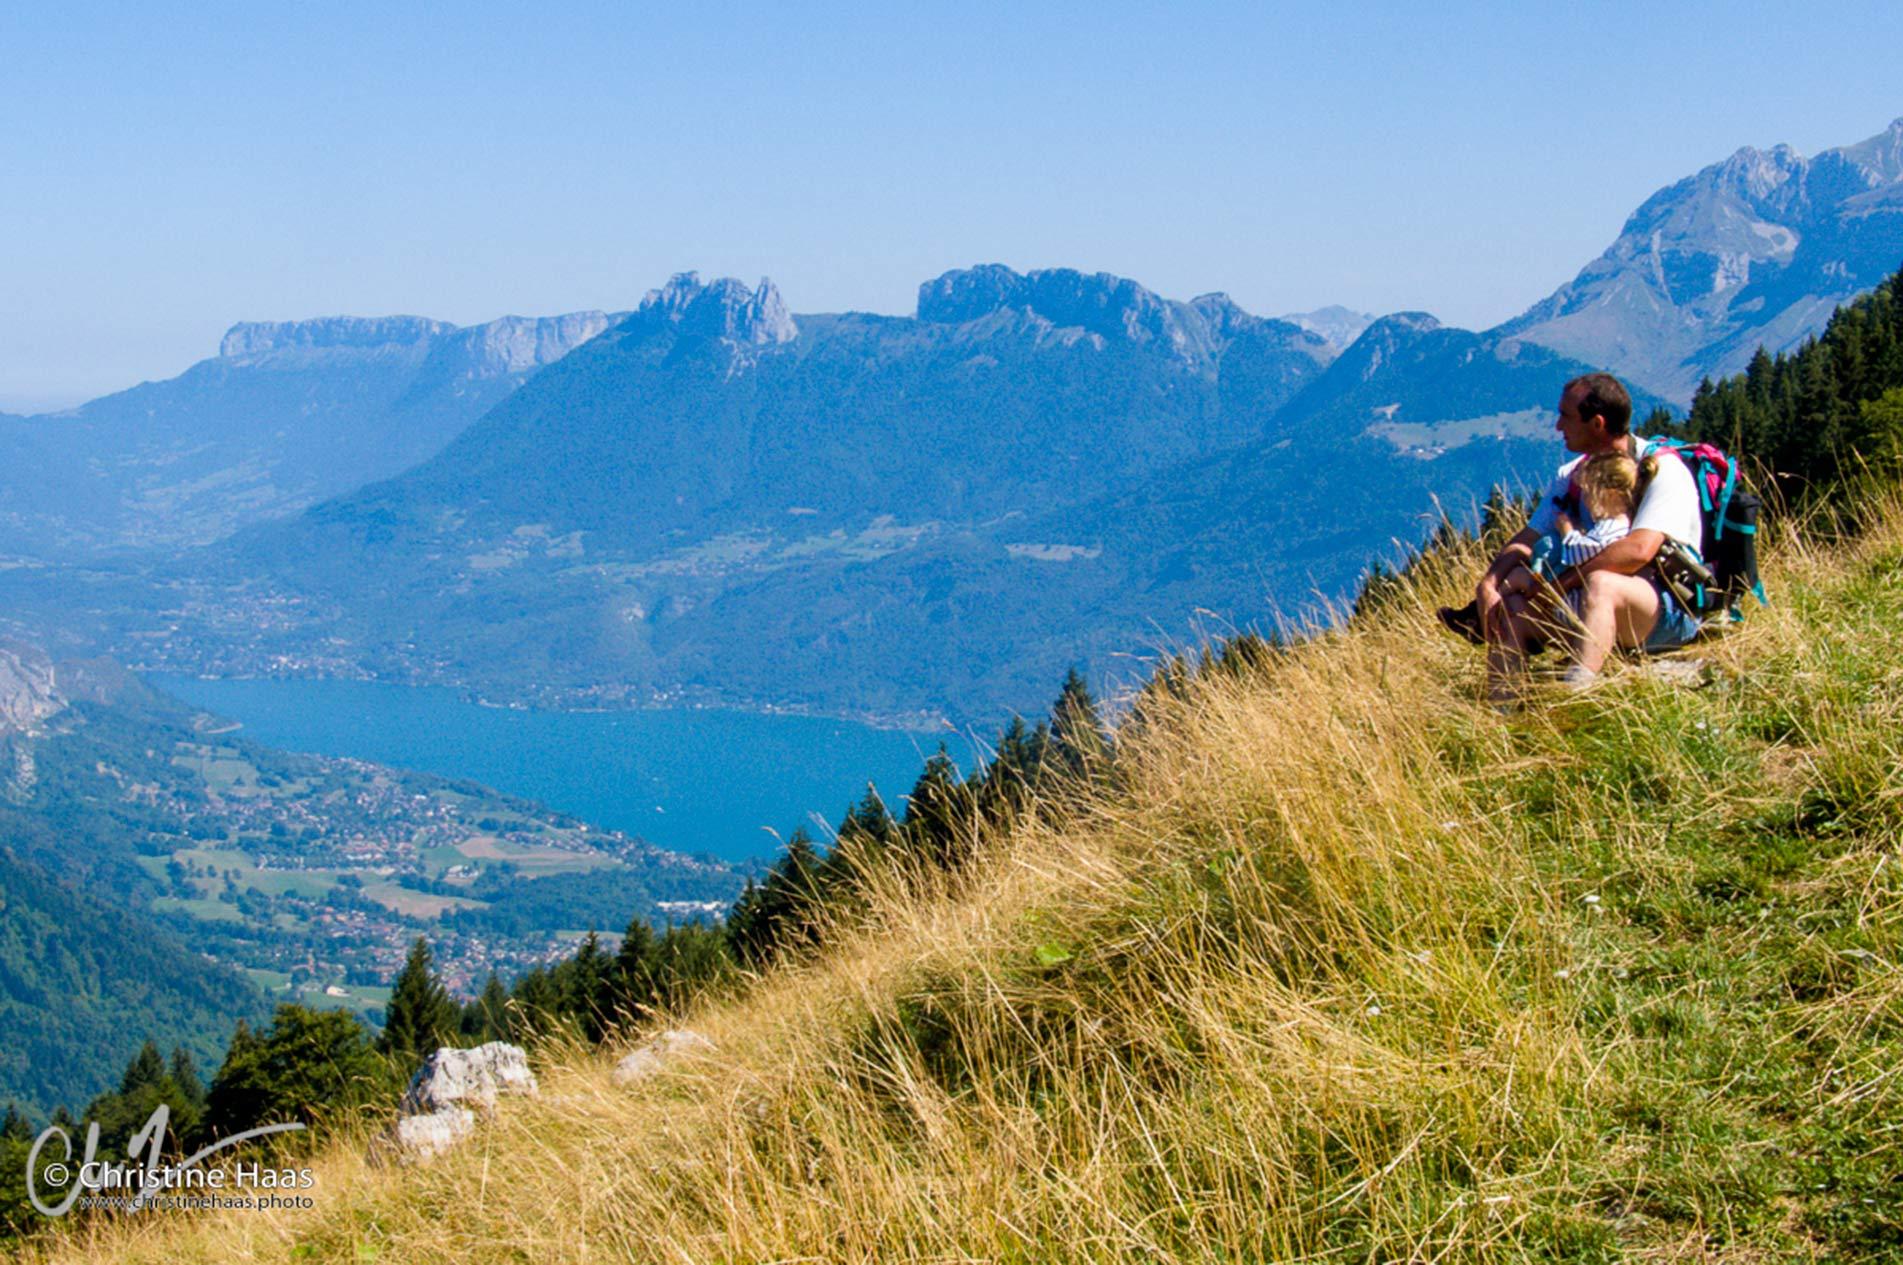 Annecy et Lac Annecy : hotel, camping,résidence, location ou un ...